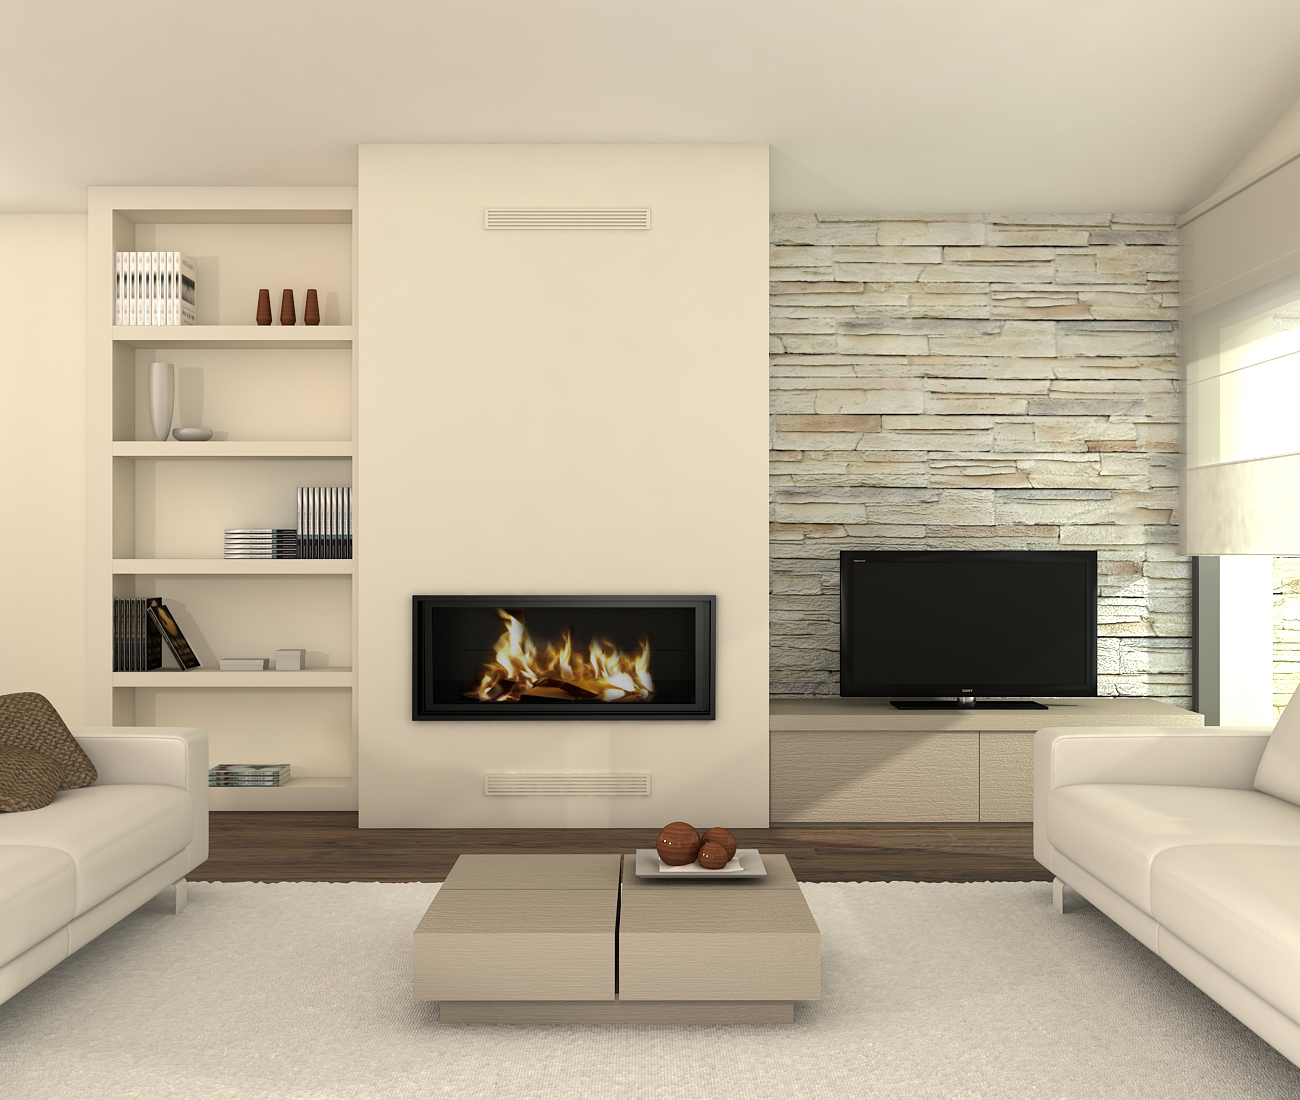 Visi n interiorista chimeneas minimalistas - Chimeneas minimalistas ...